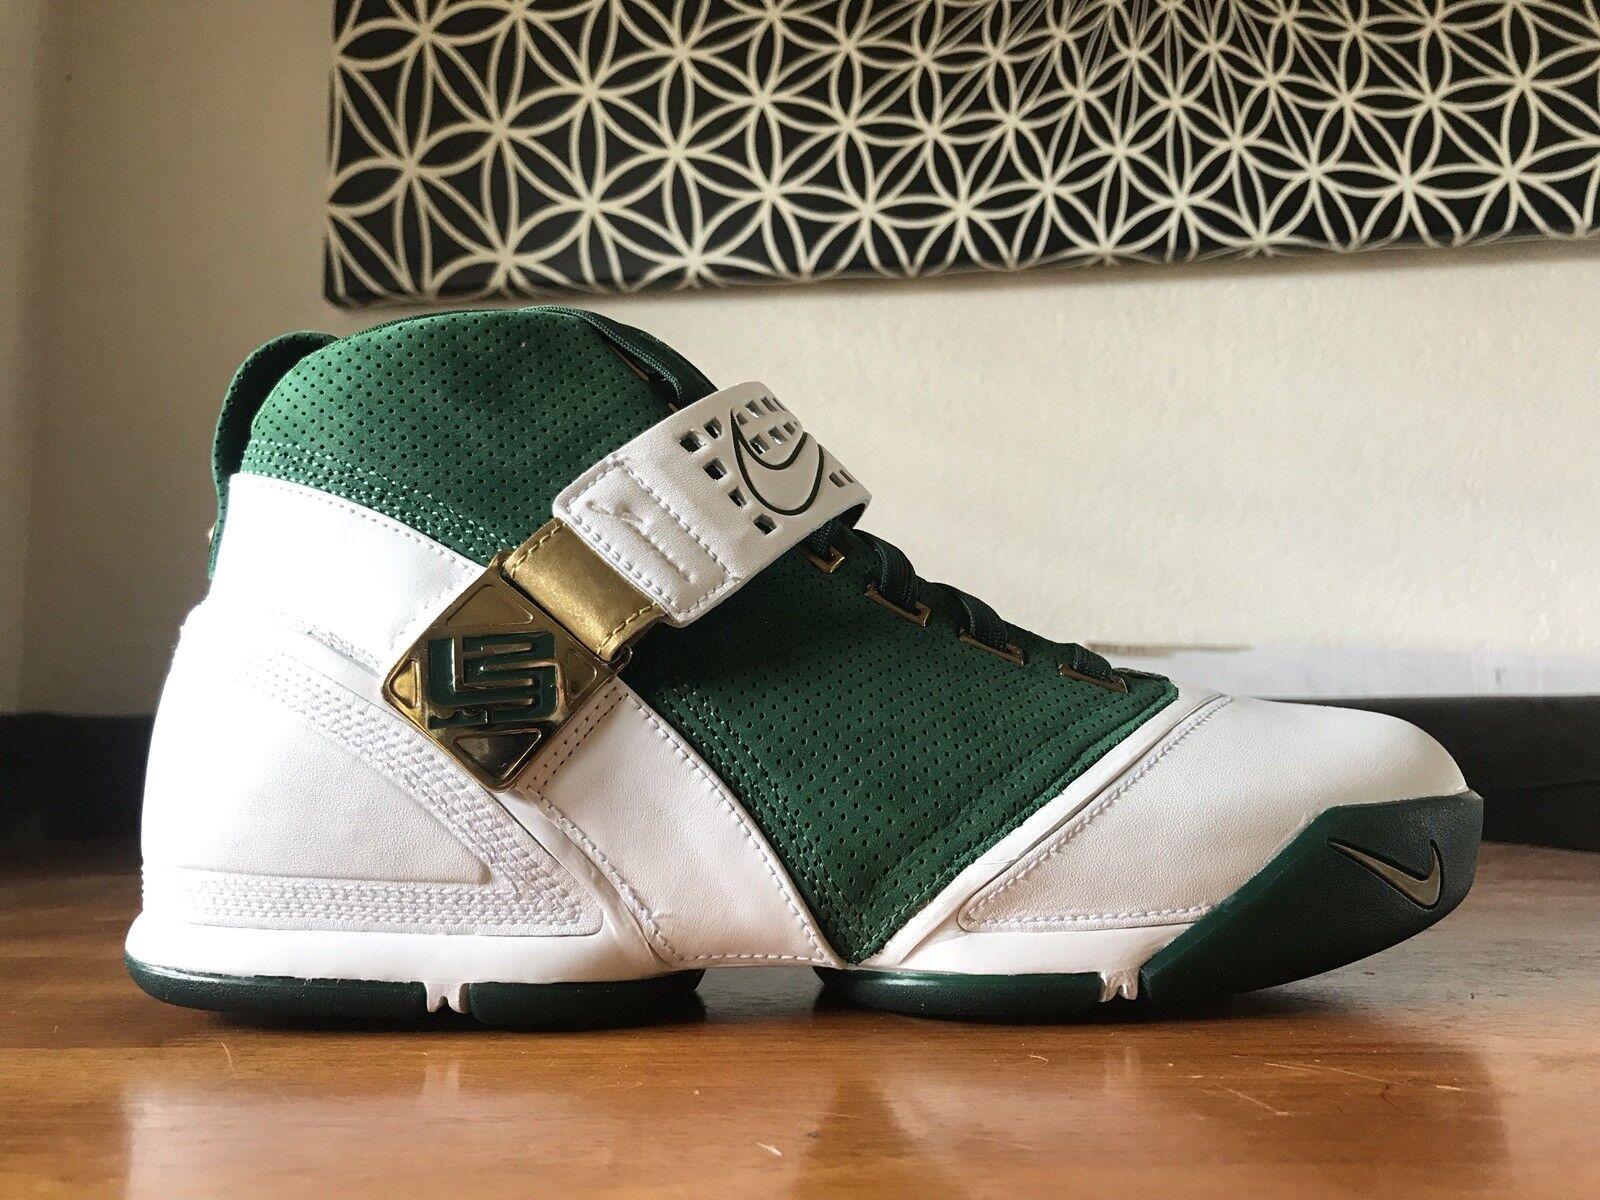 2007 Nike Zoom Lebron V  Birthday   317253 311 Size 11 DS Rare